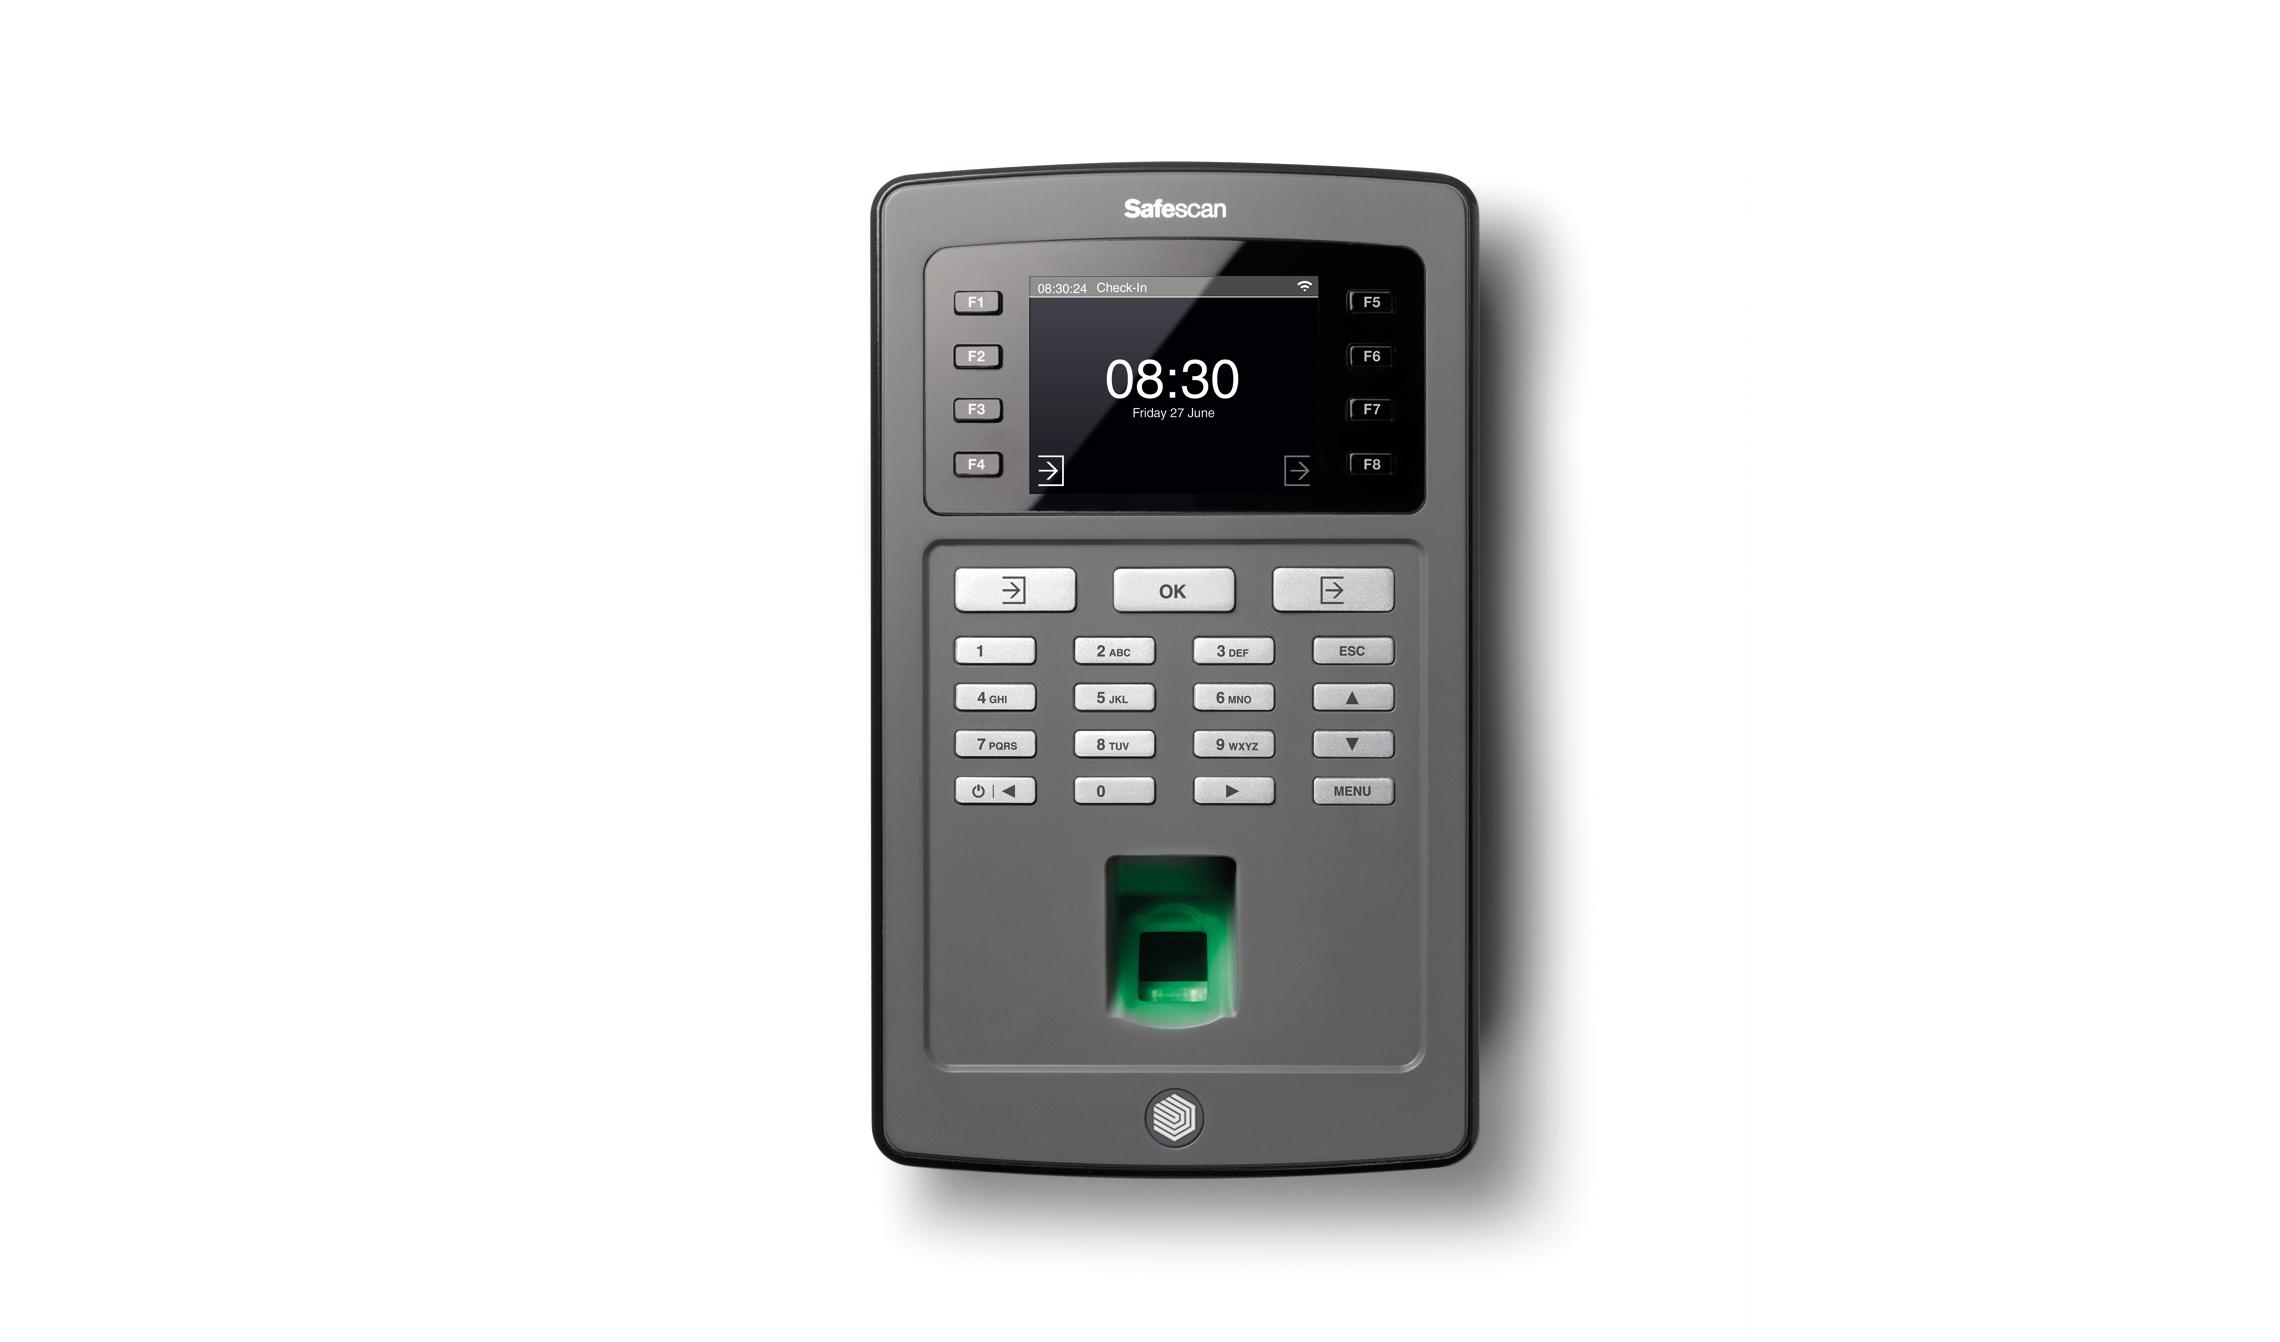 Image for Safescan TA-8035 Clocking in System WiFi Enabled Clocking in System Fingerprint Recognition Ref 125-0487